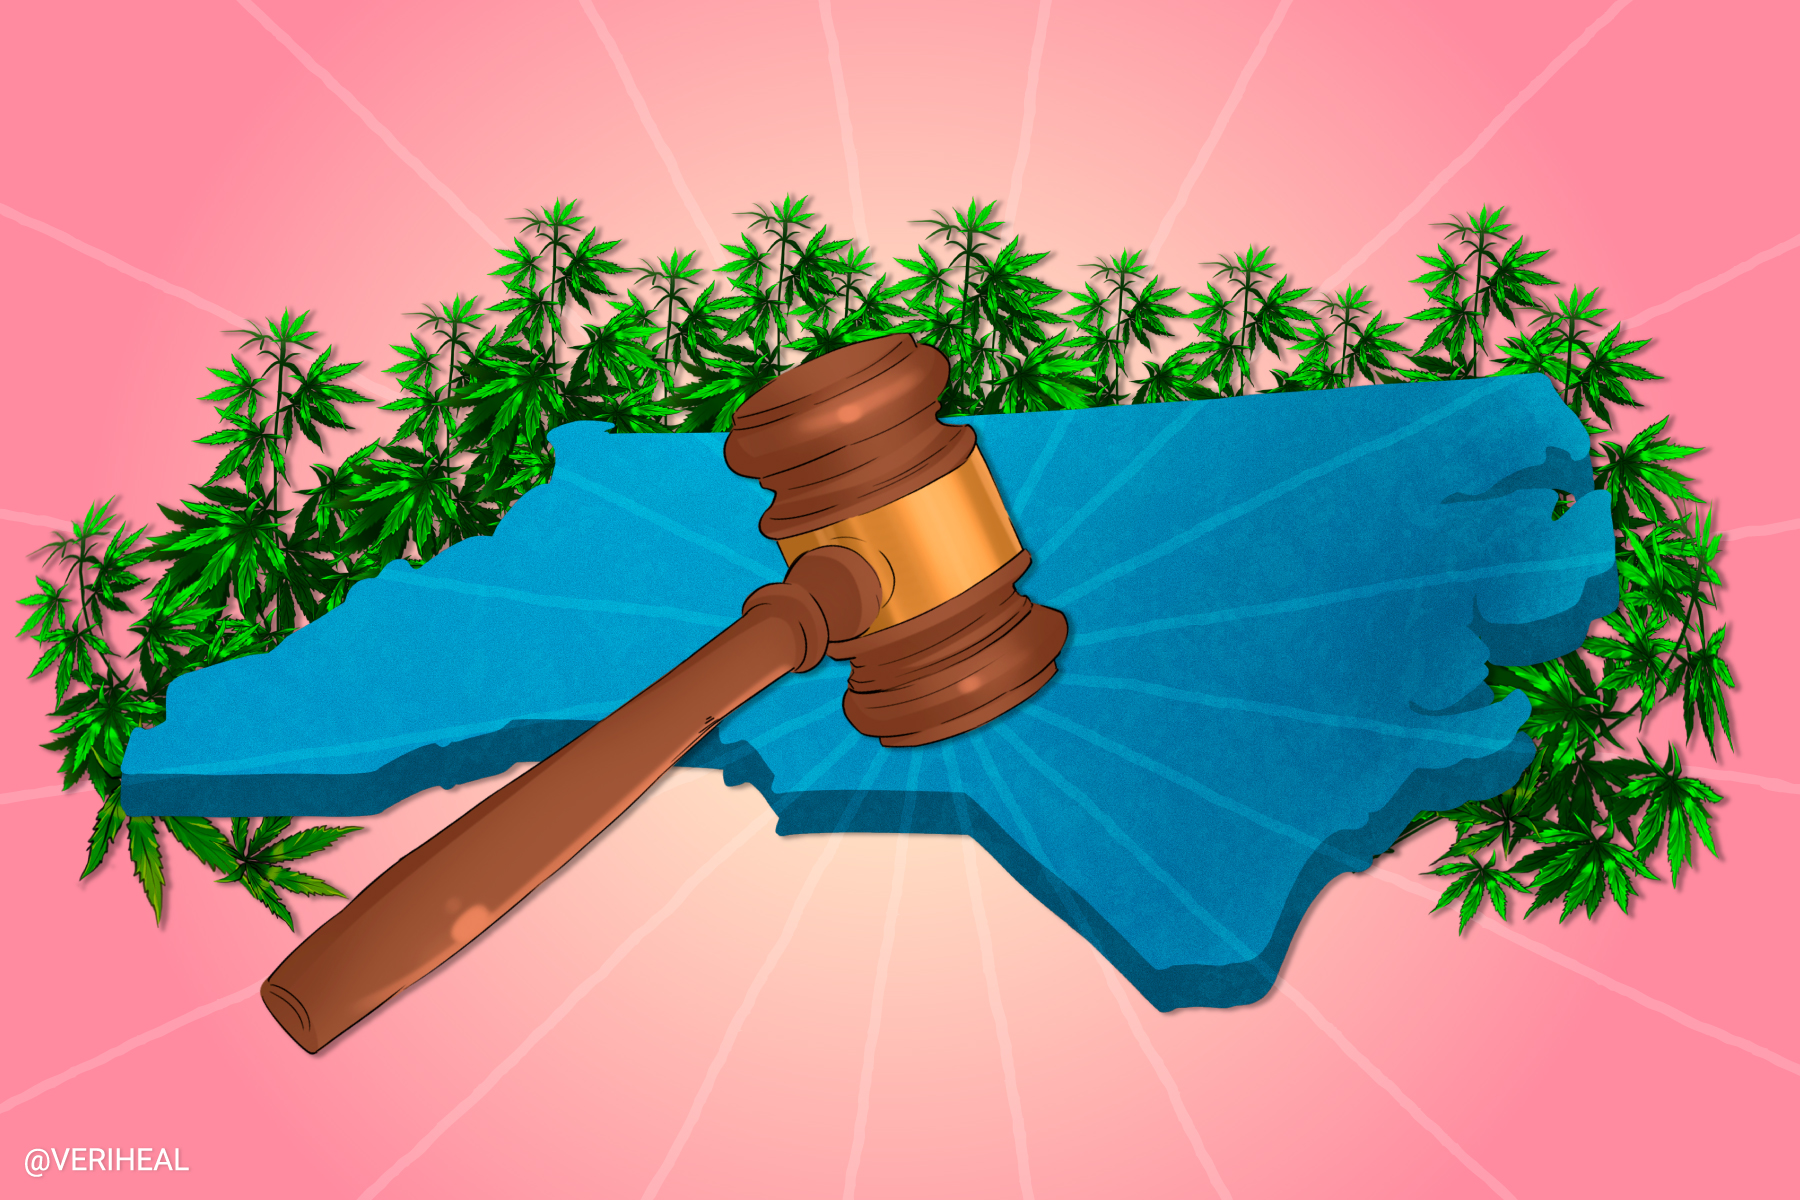 North Carolina Senate Passes Extensive Medical Cannabis Bill